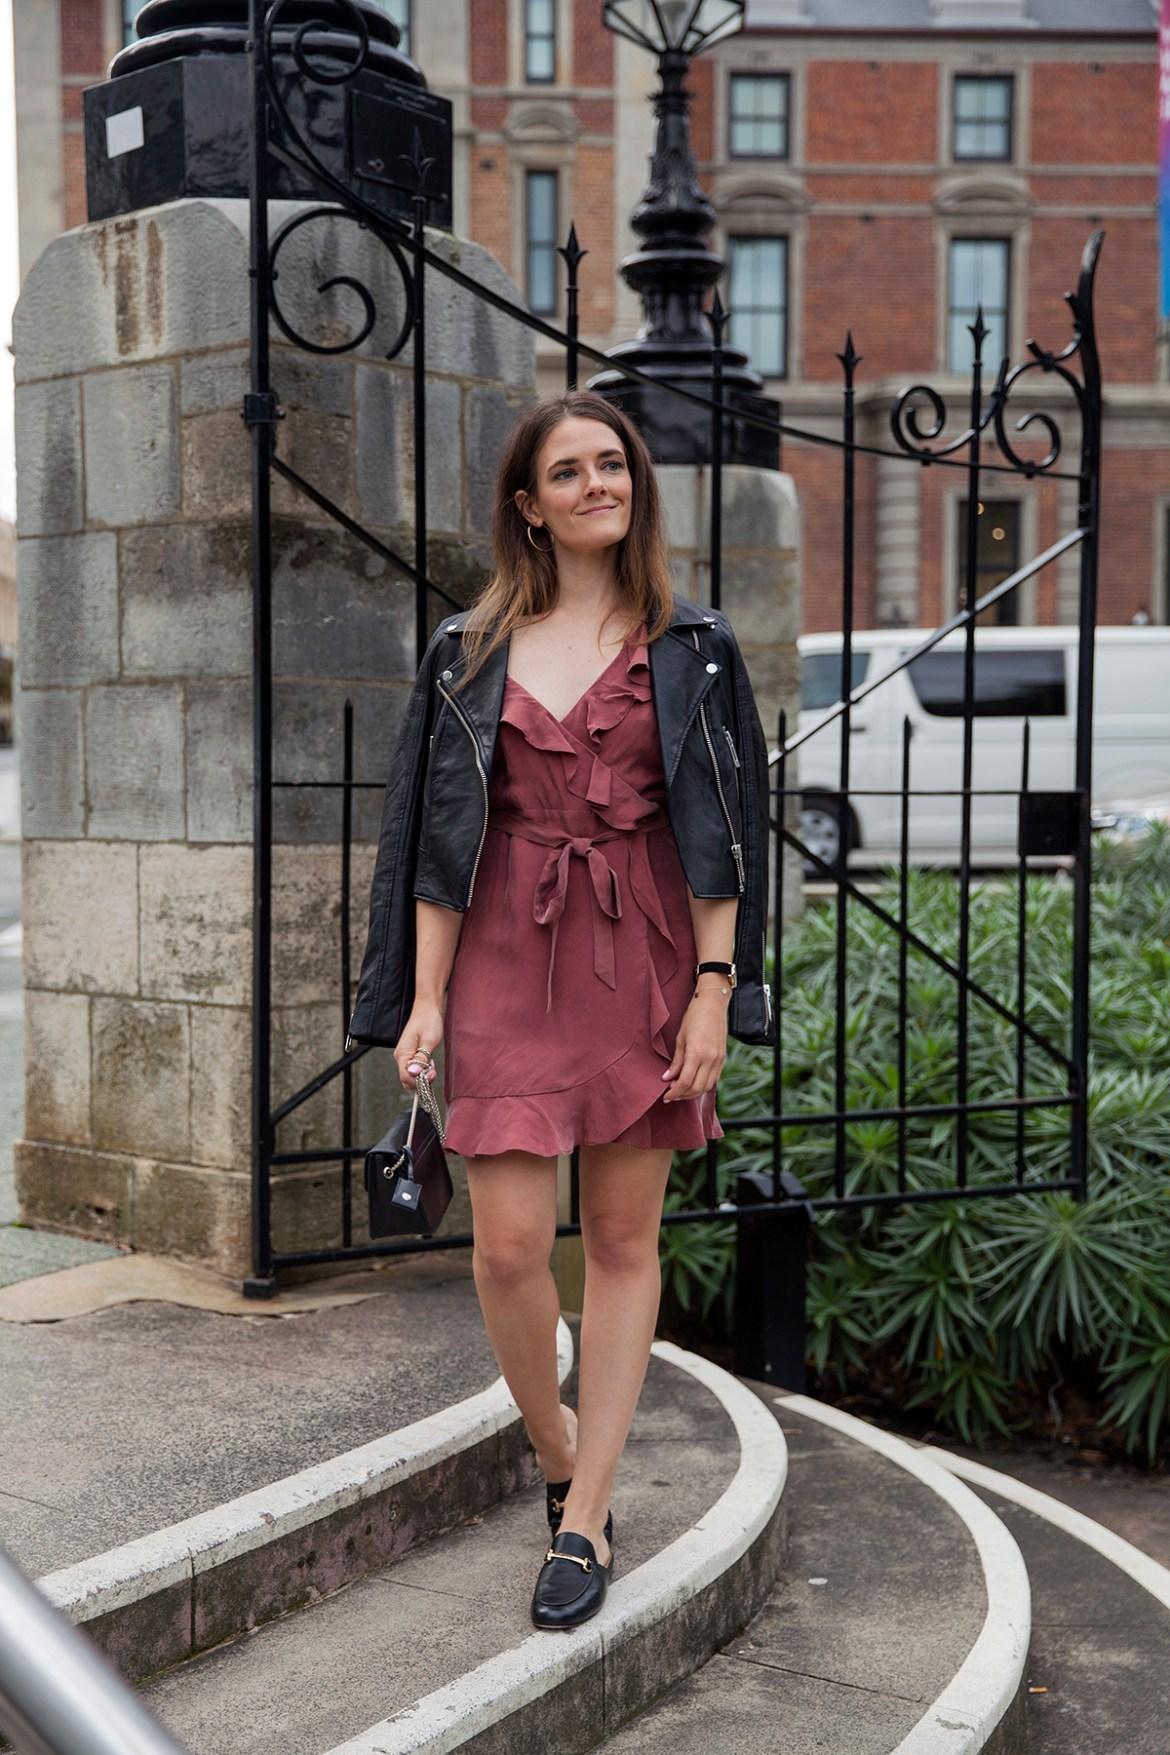 Ruffle dress by Bardot worn by fashion blogger Jenelle of Inspiring Wit